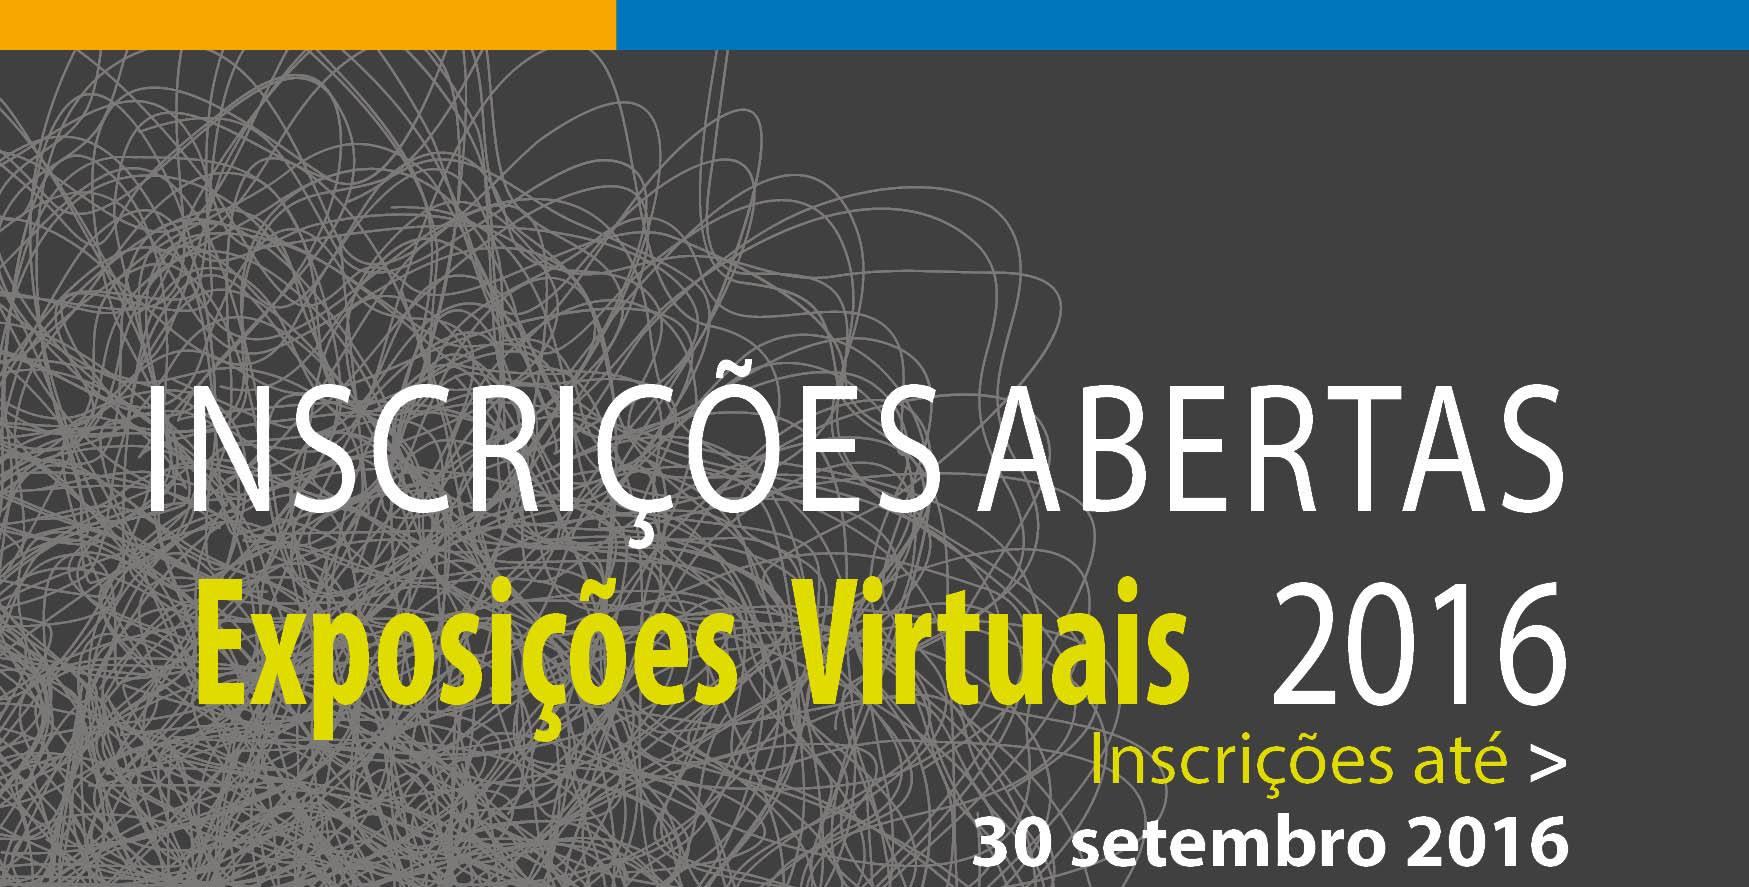 Inscrições abertas — Exposições Virtuais 2016